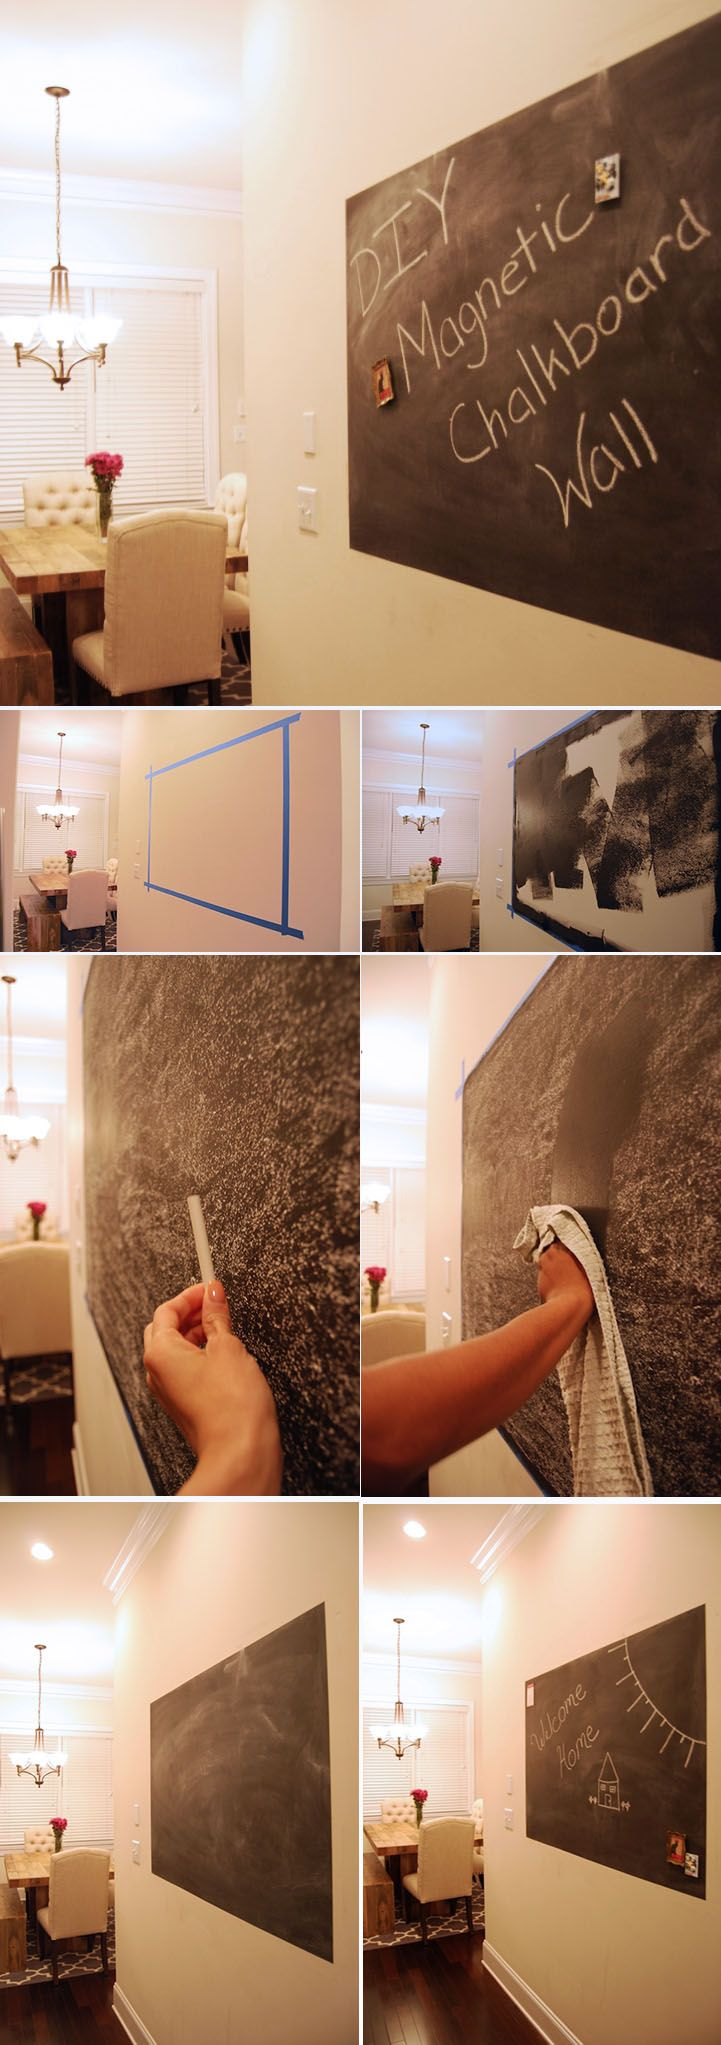 Diy Magnetic Chalkboard Wall The Community